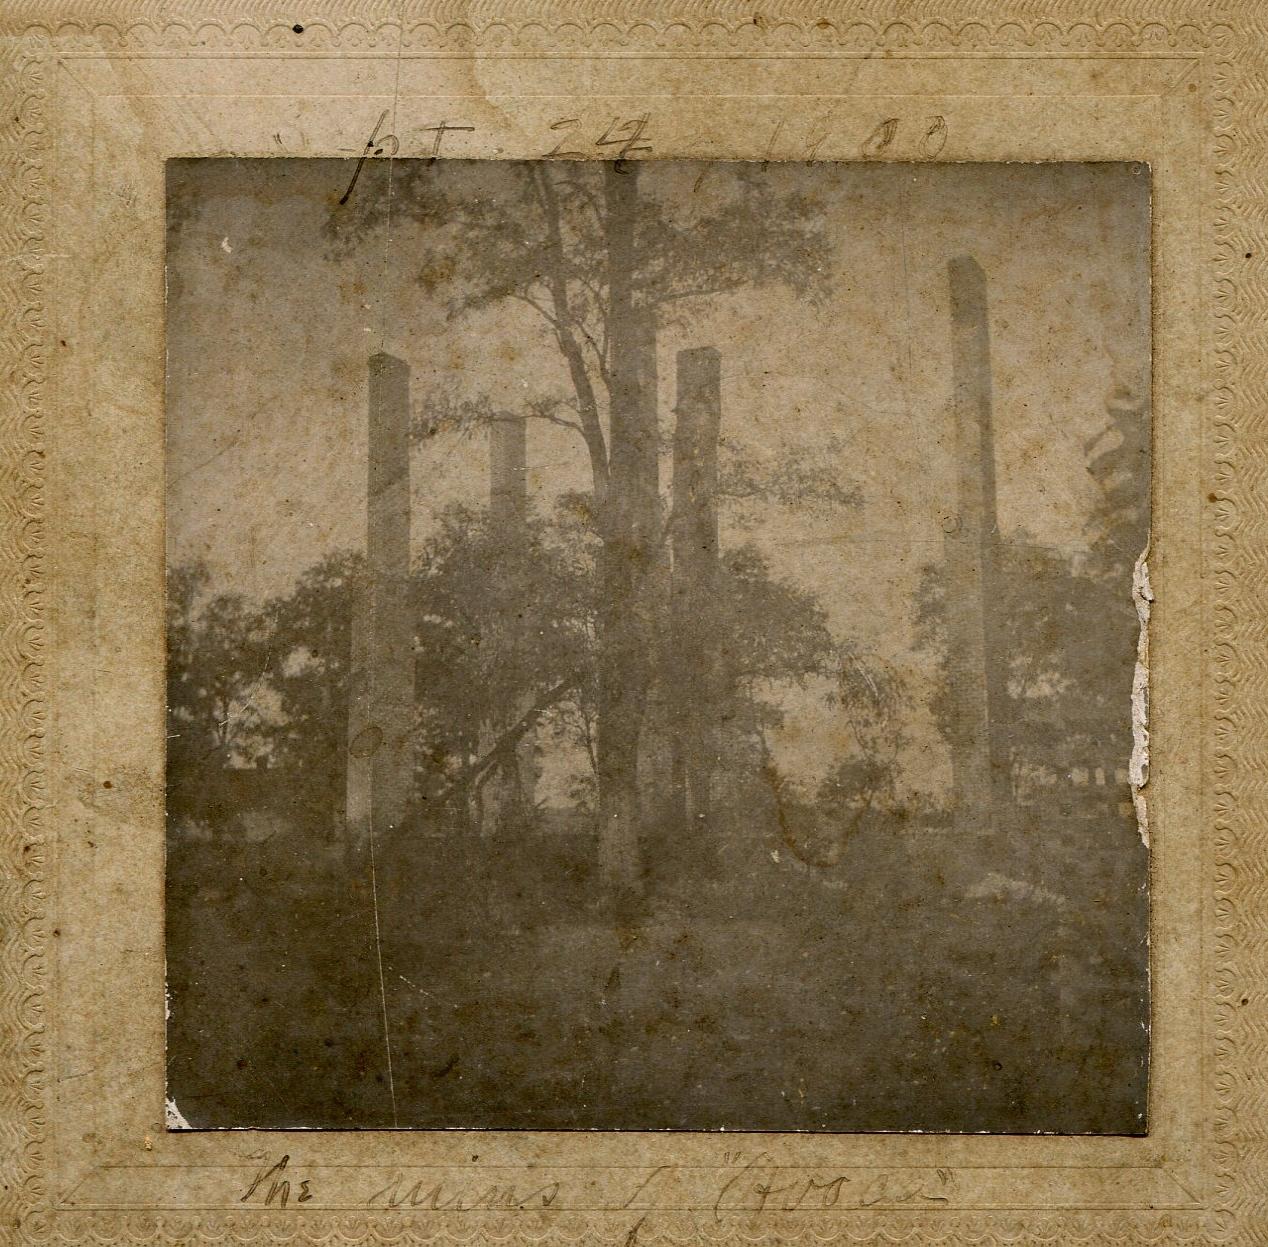 """Sept. 24, 1900, Ruins of   Avoca"""